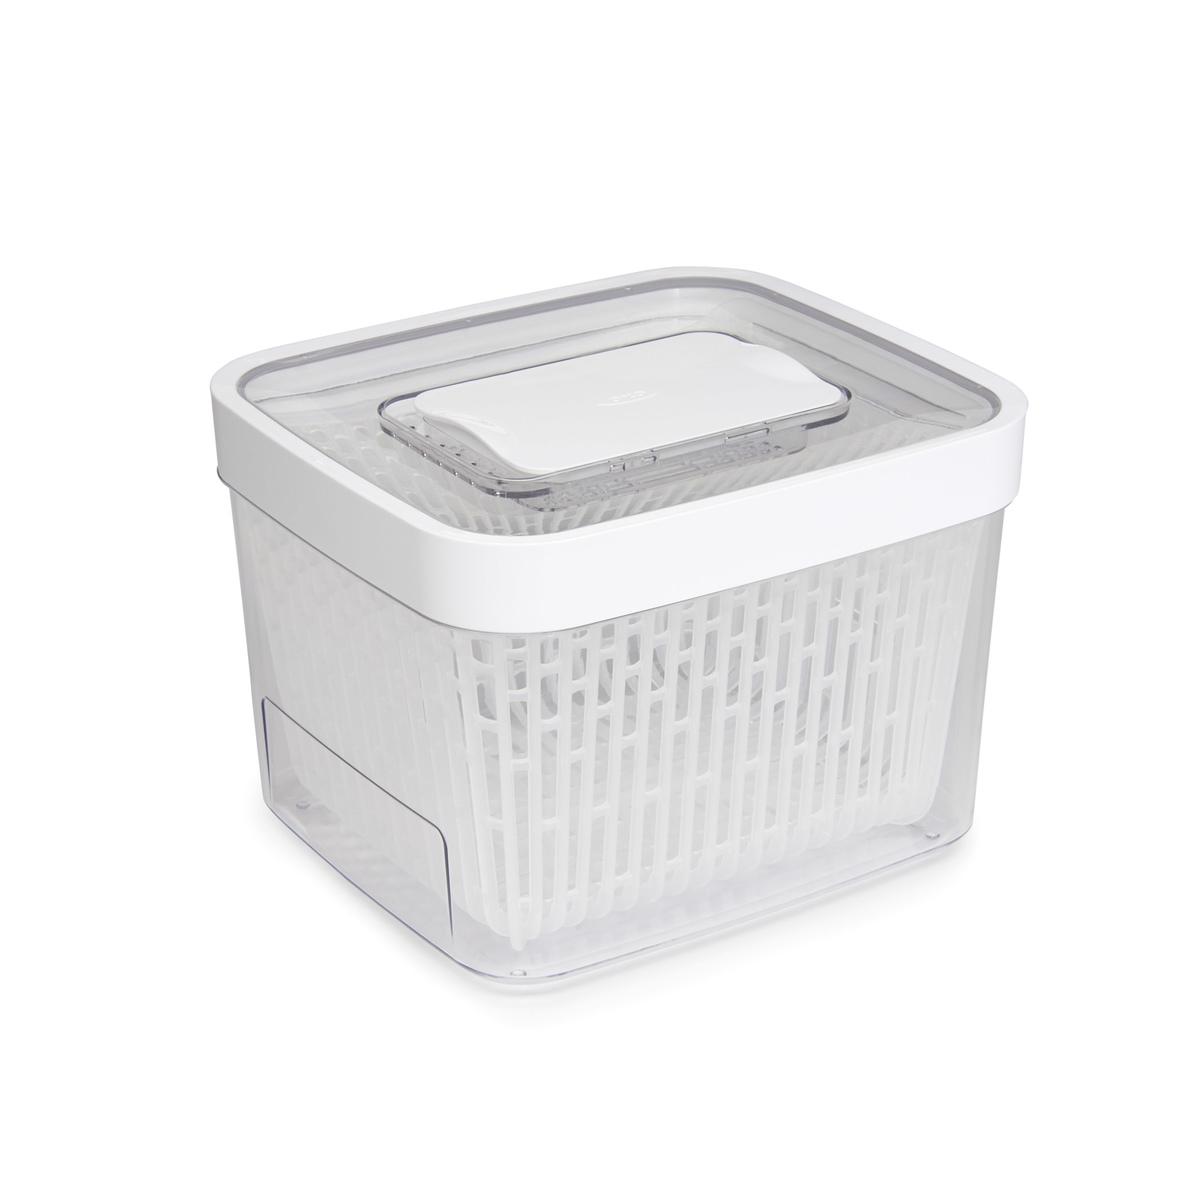 Онлайн каталог PROMENU: Контейнер для хранения с клапаном OXO FOOD STORAGE, 19х21х15 см, белый                               11140000